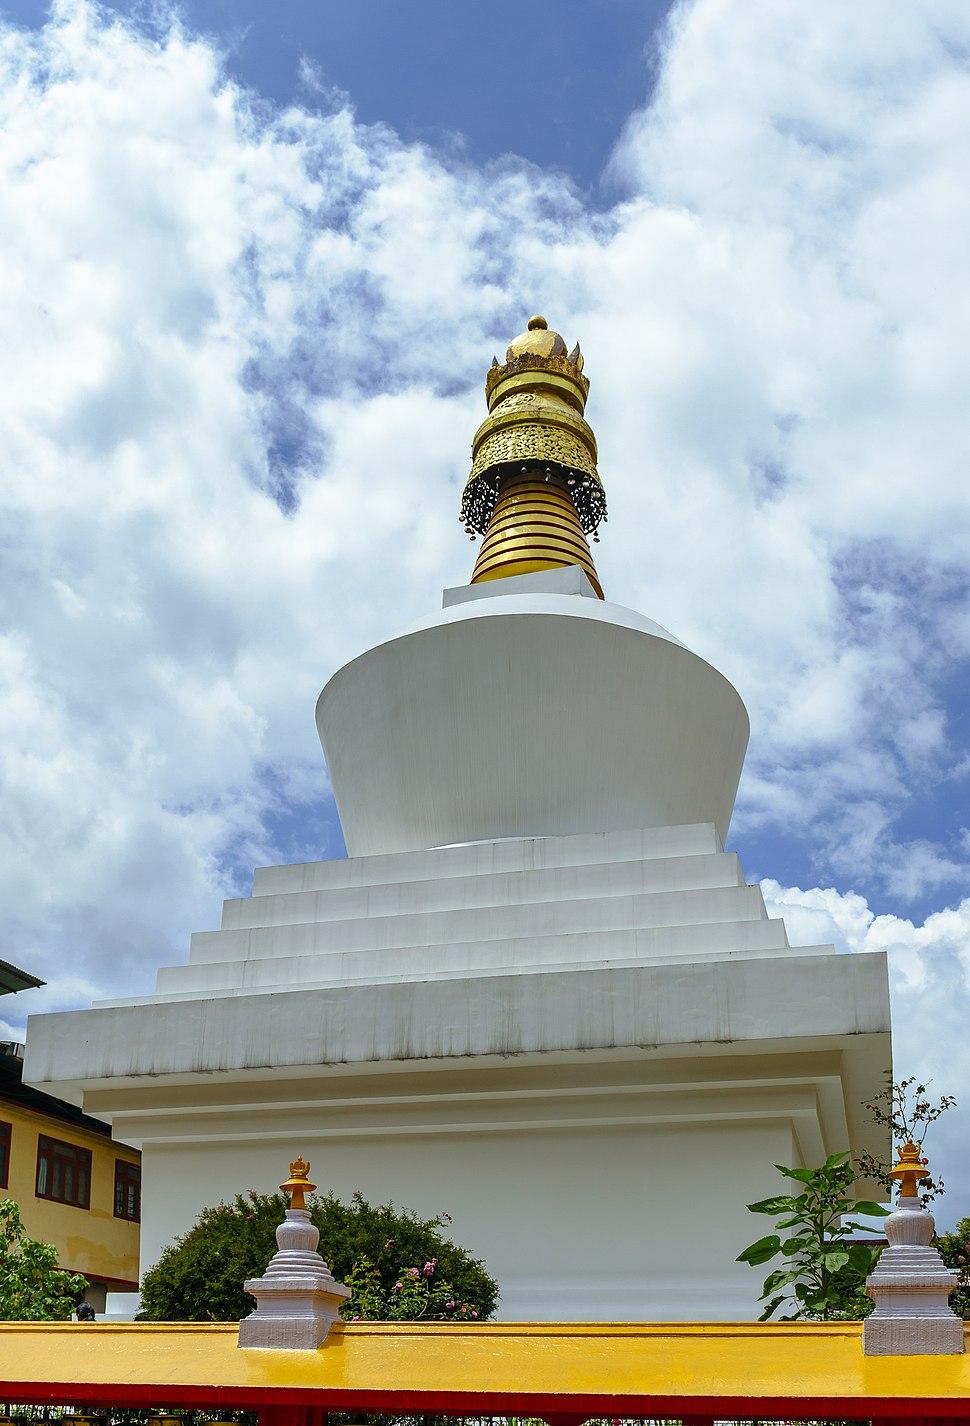 Do-drul Chorten Stupa, Gangtok, Sikkim